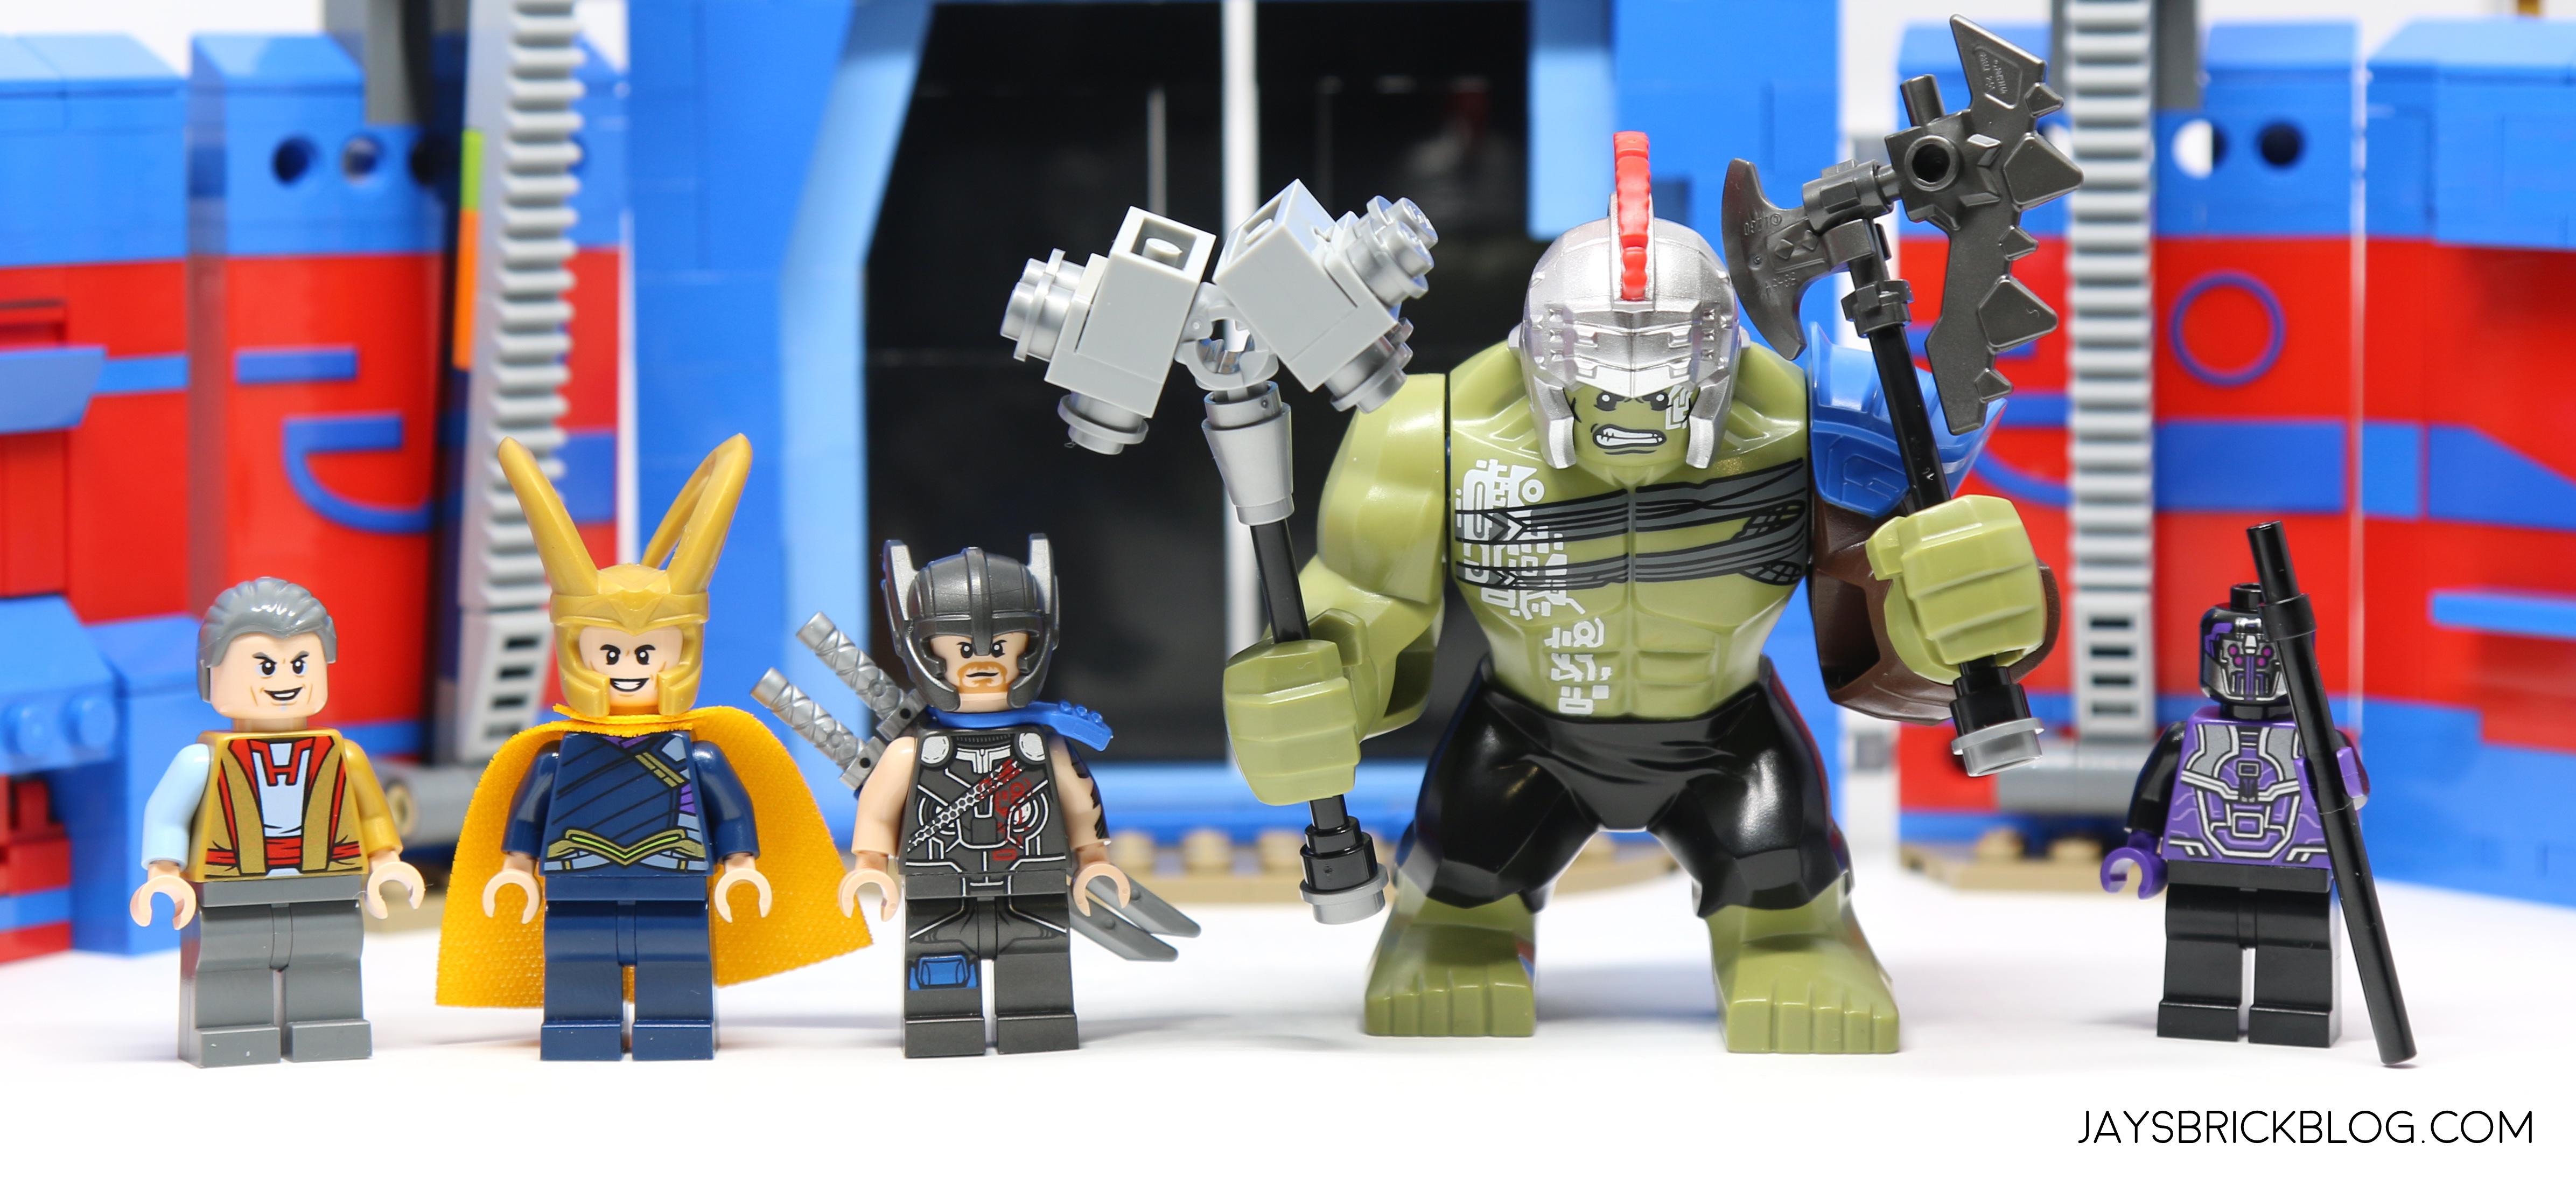 lego avengers hulk vs thor - photo #18